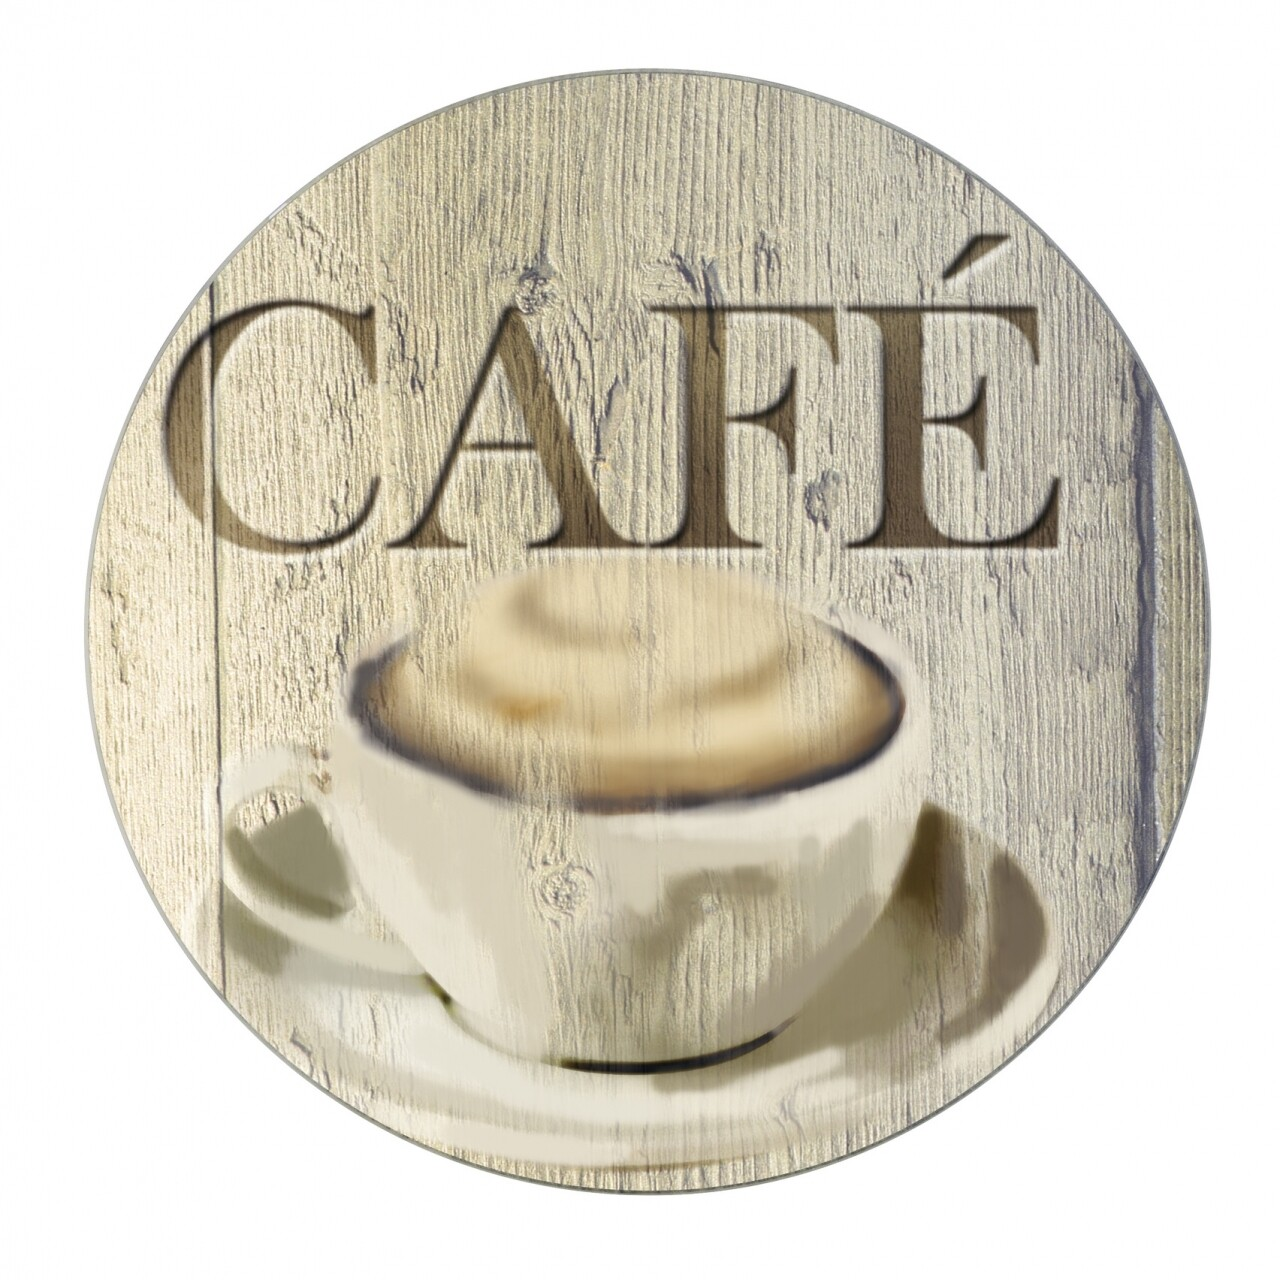 Suport pentru recipiente fierbinti Cafe, Wenko, Ø 20 cm, sticla/silicon, negru/rosu